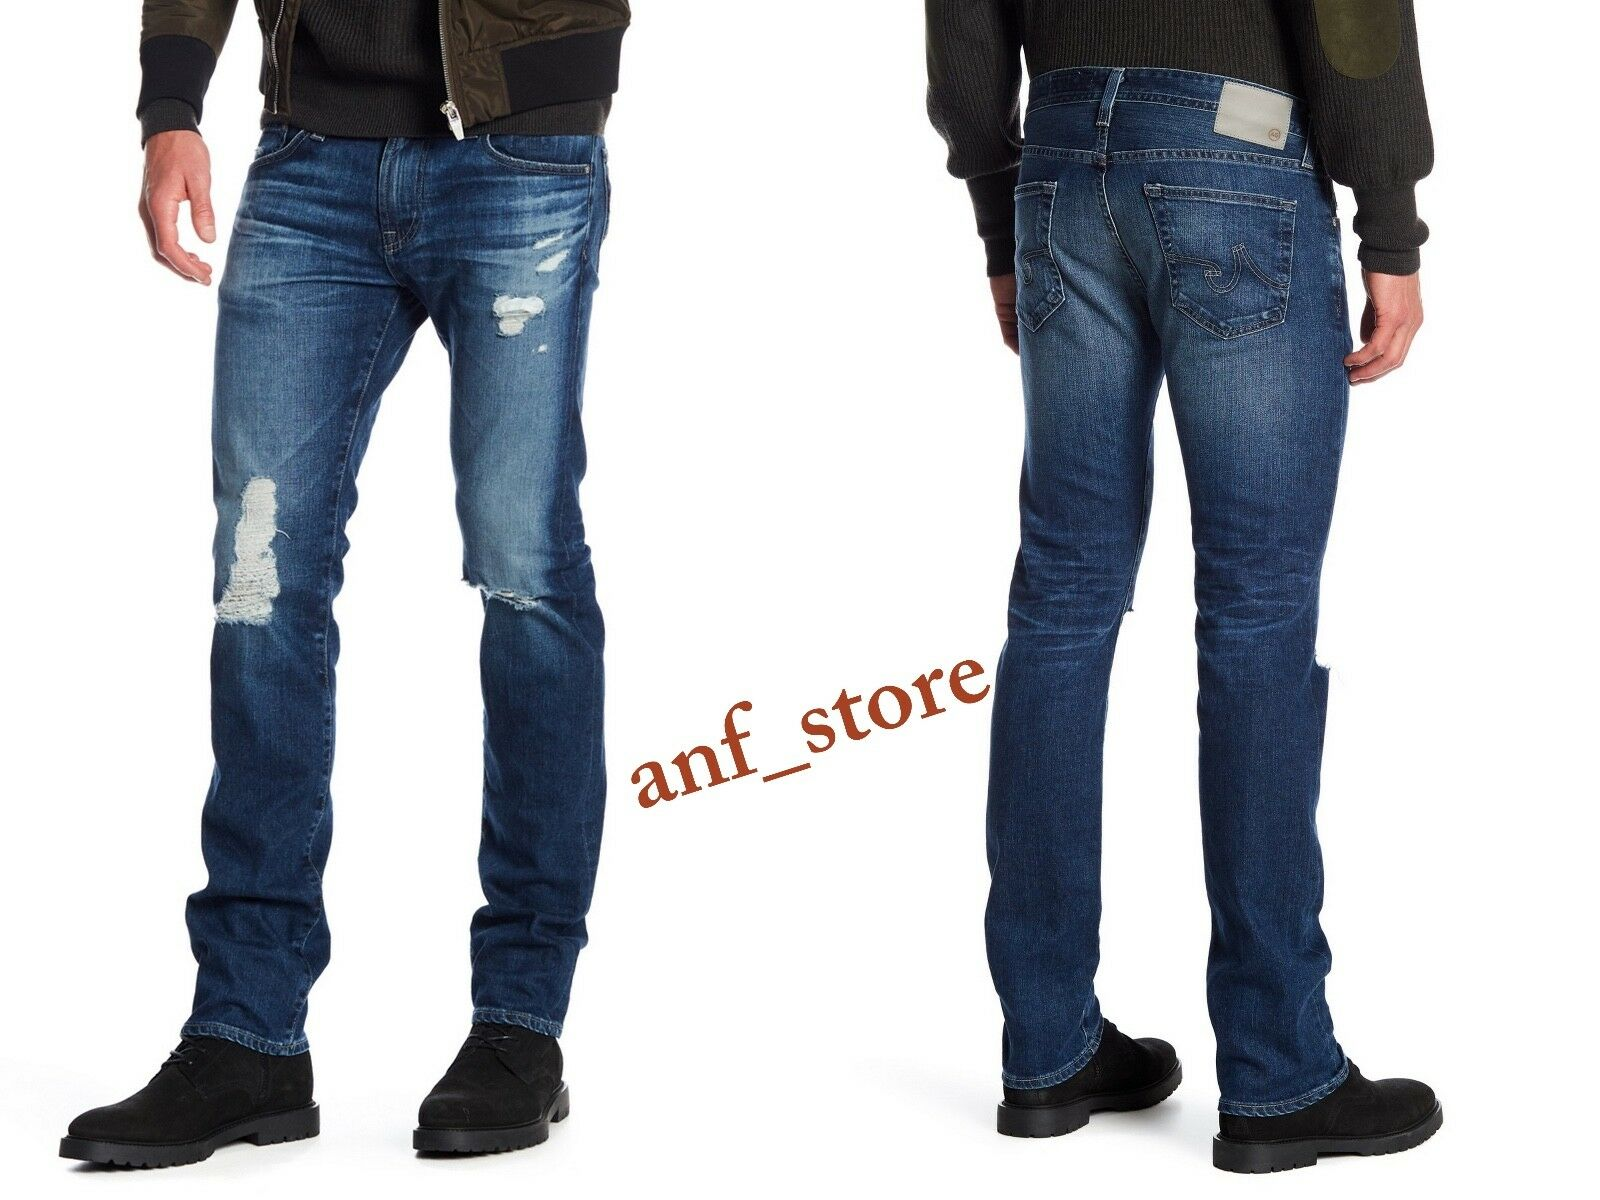 0343b24836 NWT AG goldschmied MATCHBOX Slim Straight Stretch Jeans 32x32 ...